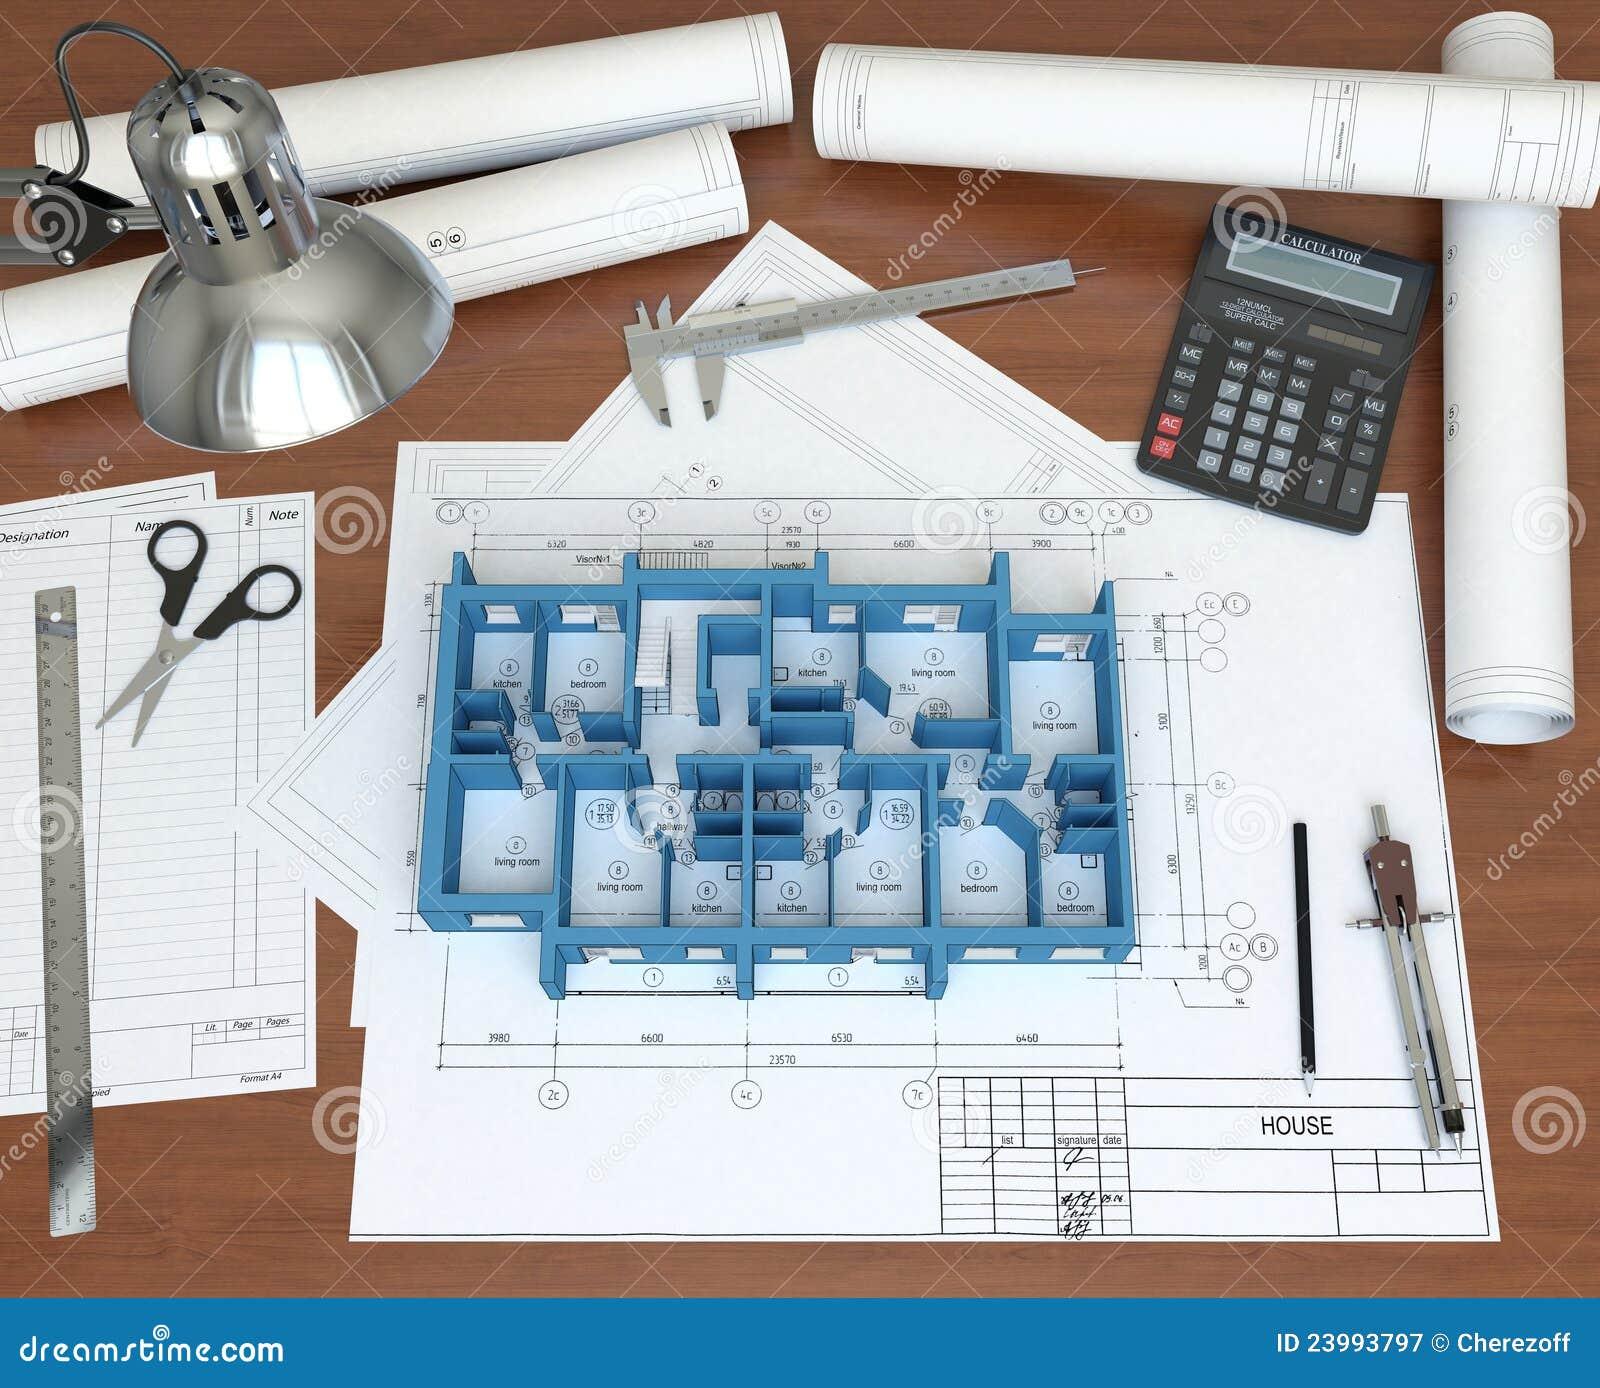 Casa modelo 3d en el arquitecto de escritorio for Modelo de casa en 3d